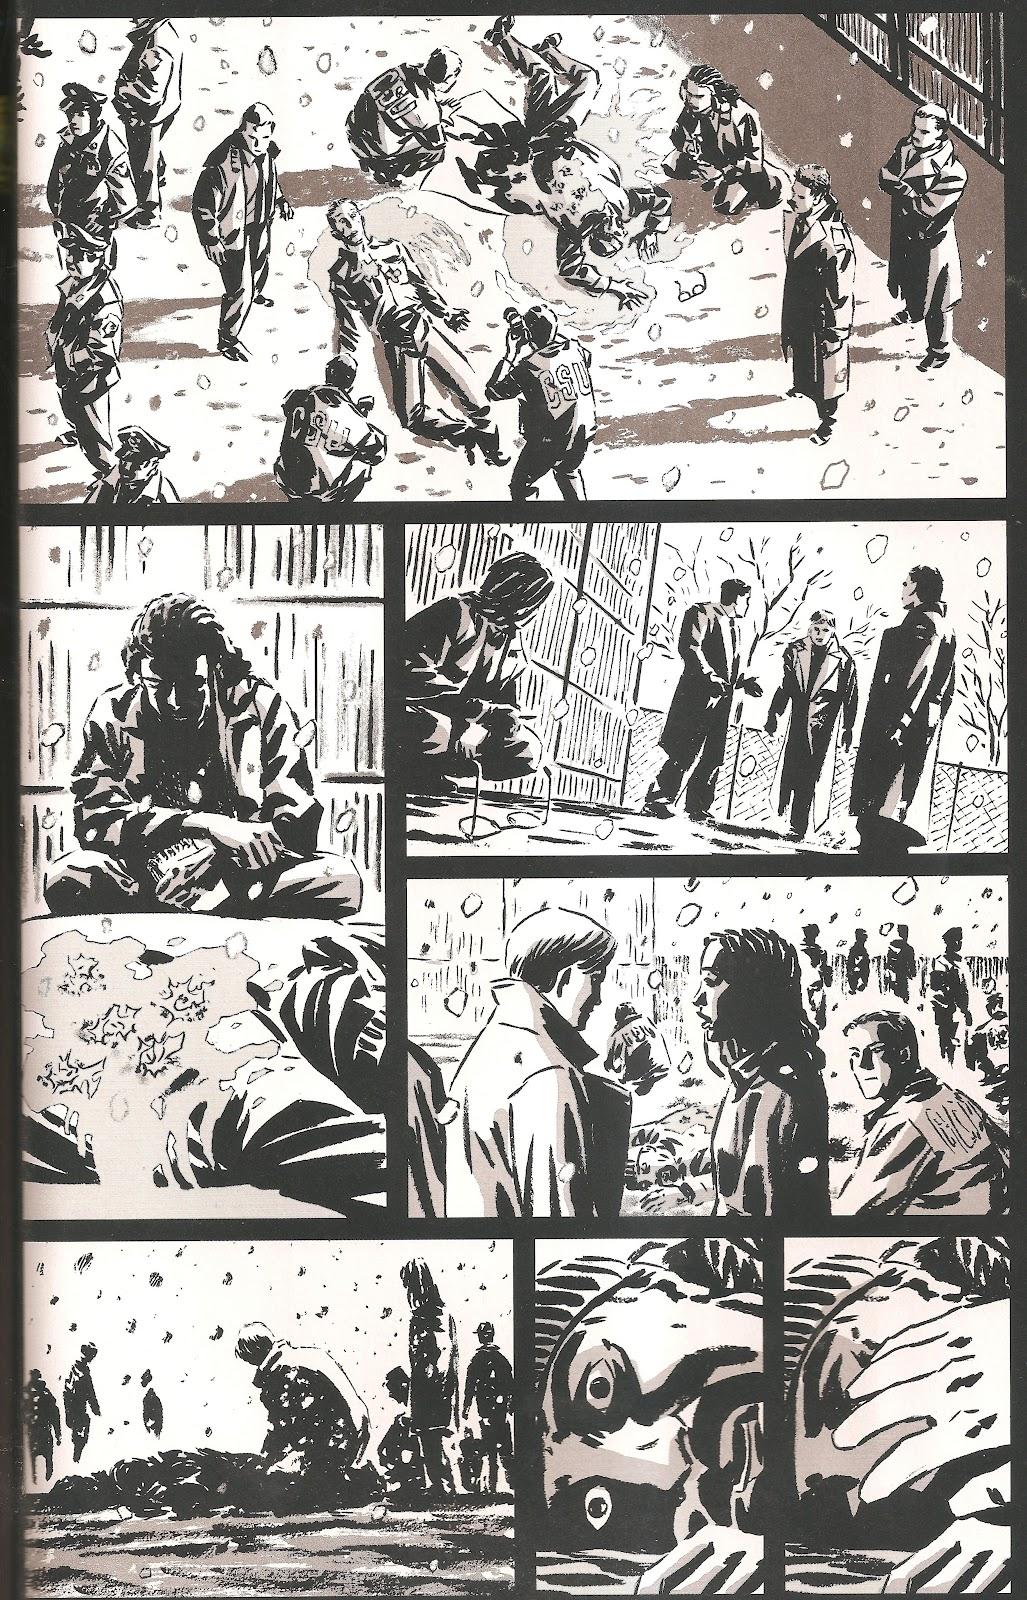 Aesthetic Nerdom: Gotham Central: A Retrospective